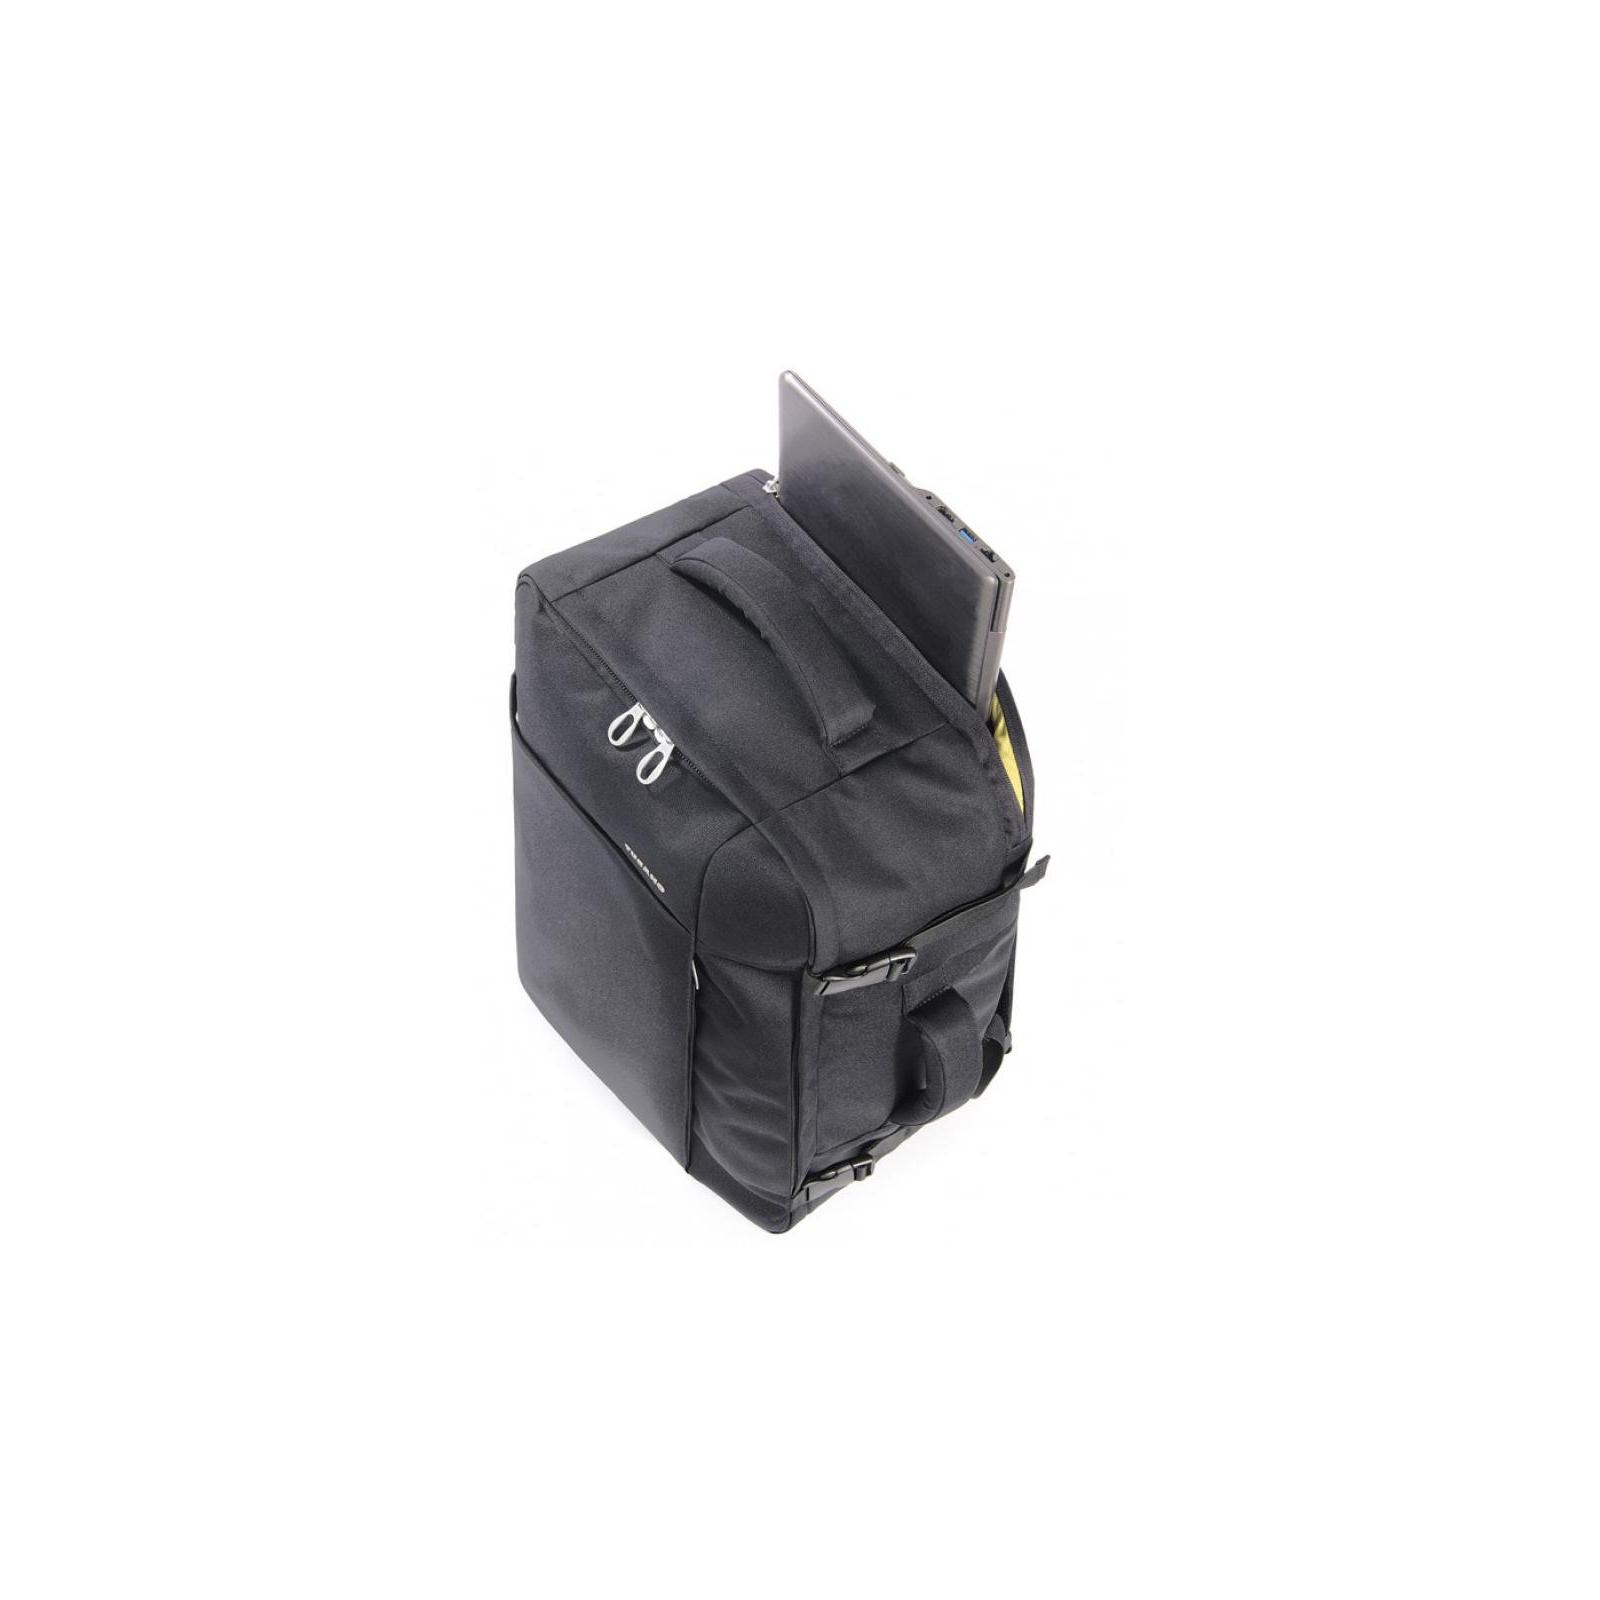 "Рюкзак для ноутбука Tucano 17.3"" TUGO' L CABIN black (BKTUG-L-BK) изображение 4"